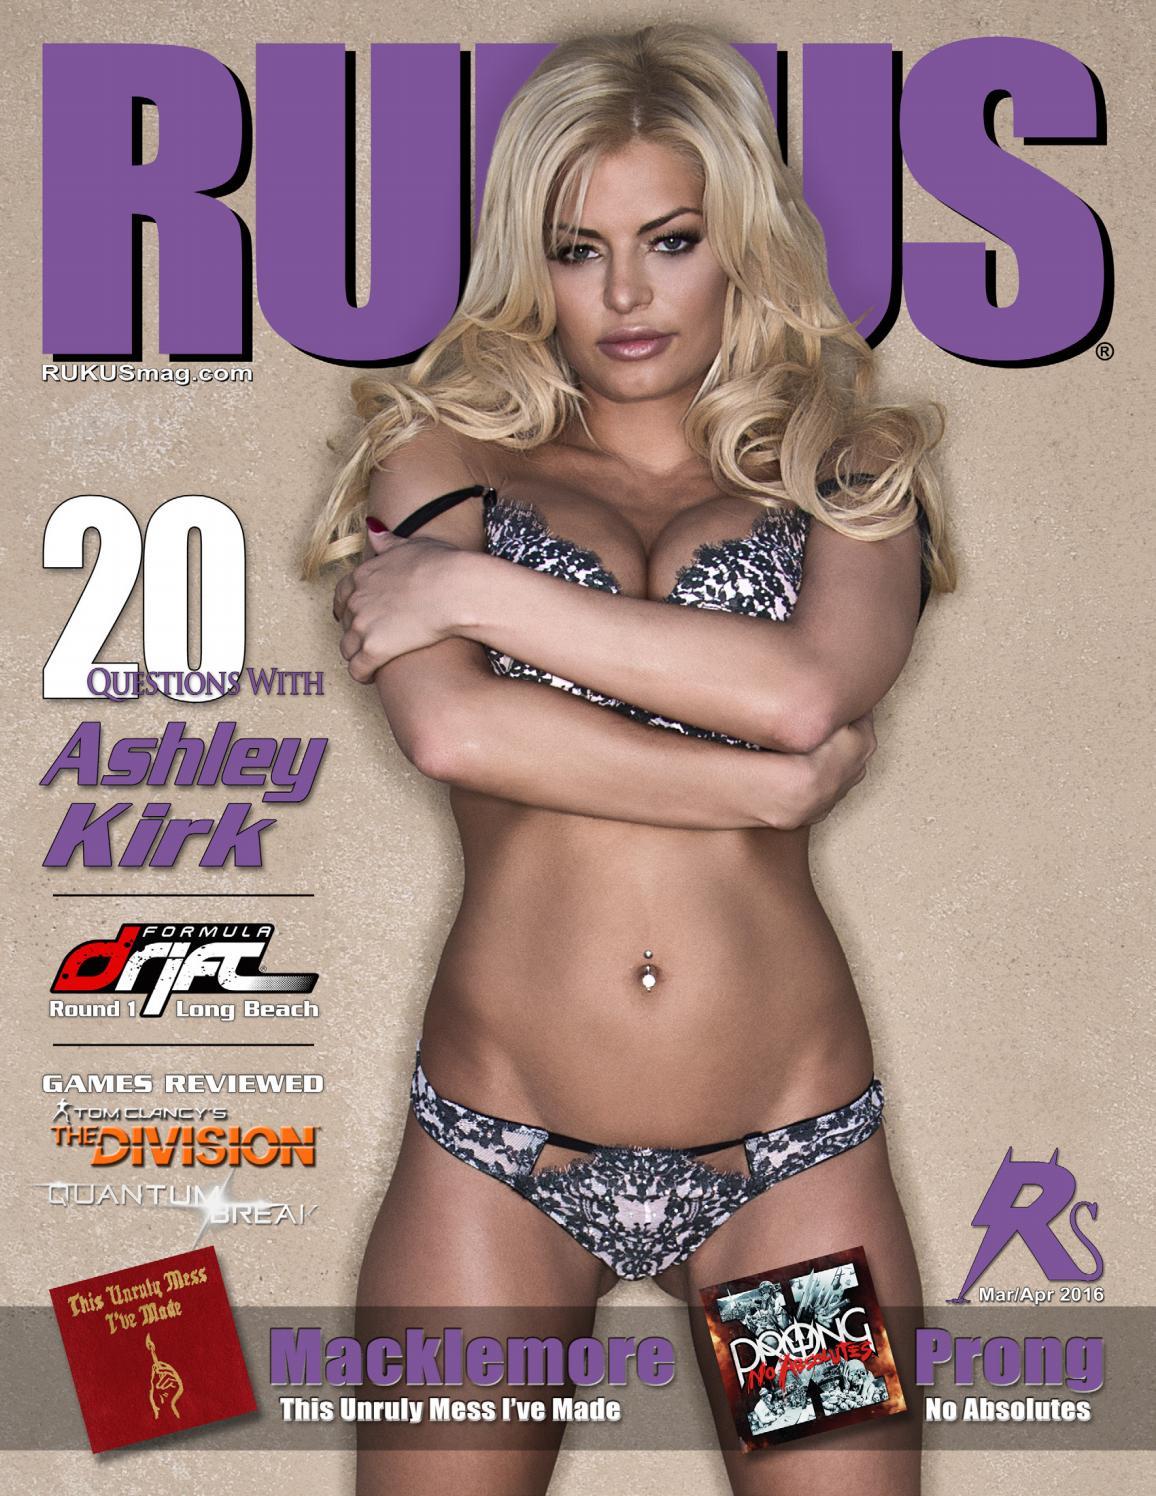 Ashley Kirk bikini (1)